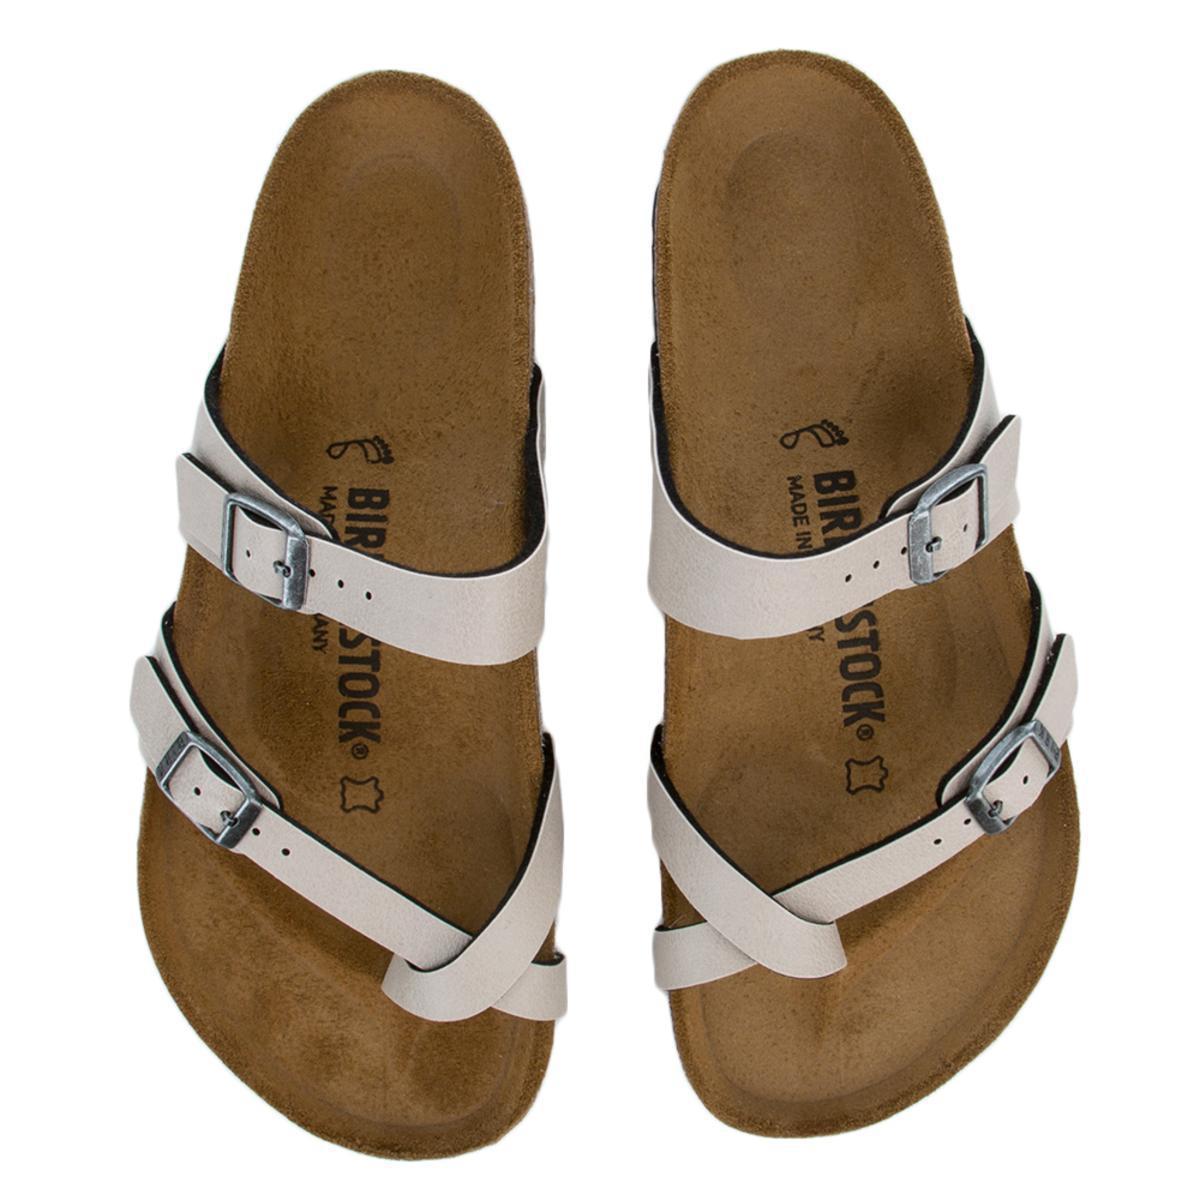 5e42d5014546 Birkenstock. Women s Mayari Birko-flor Pull Up Stone Sandals